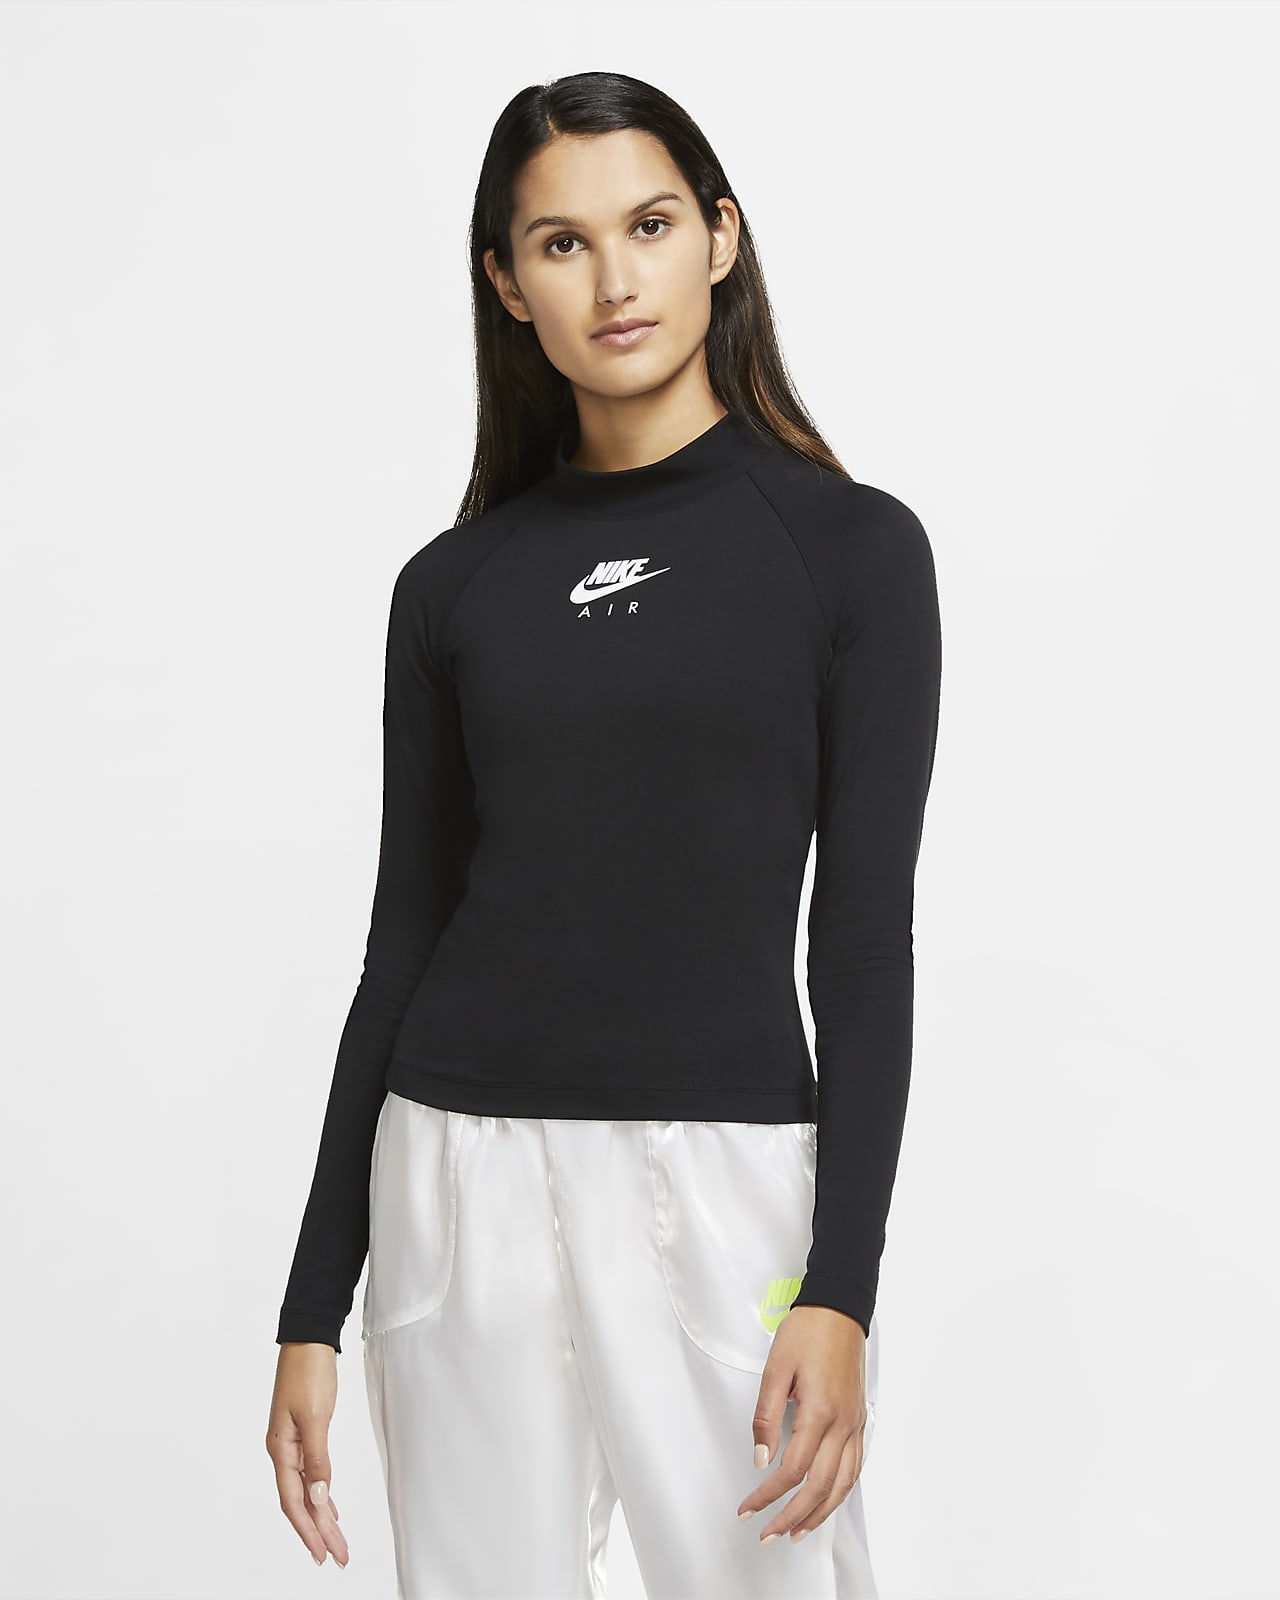 Damska koszulka z długim rękawem Nike Air